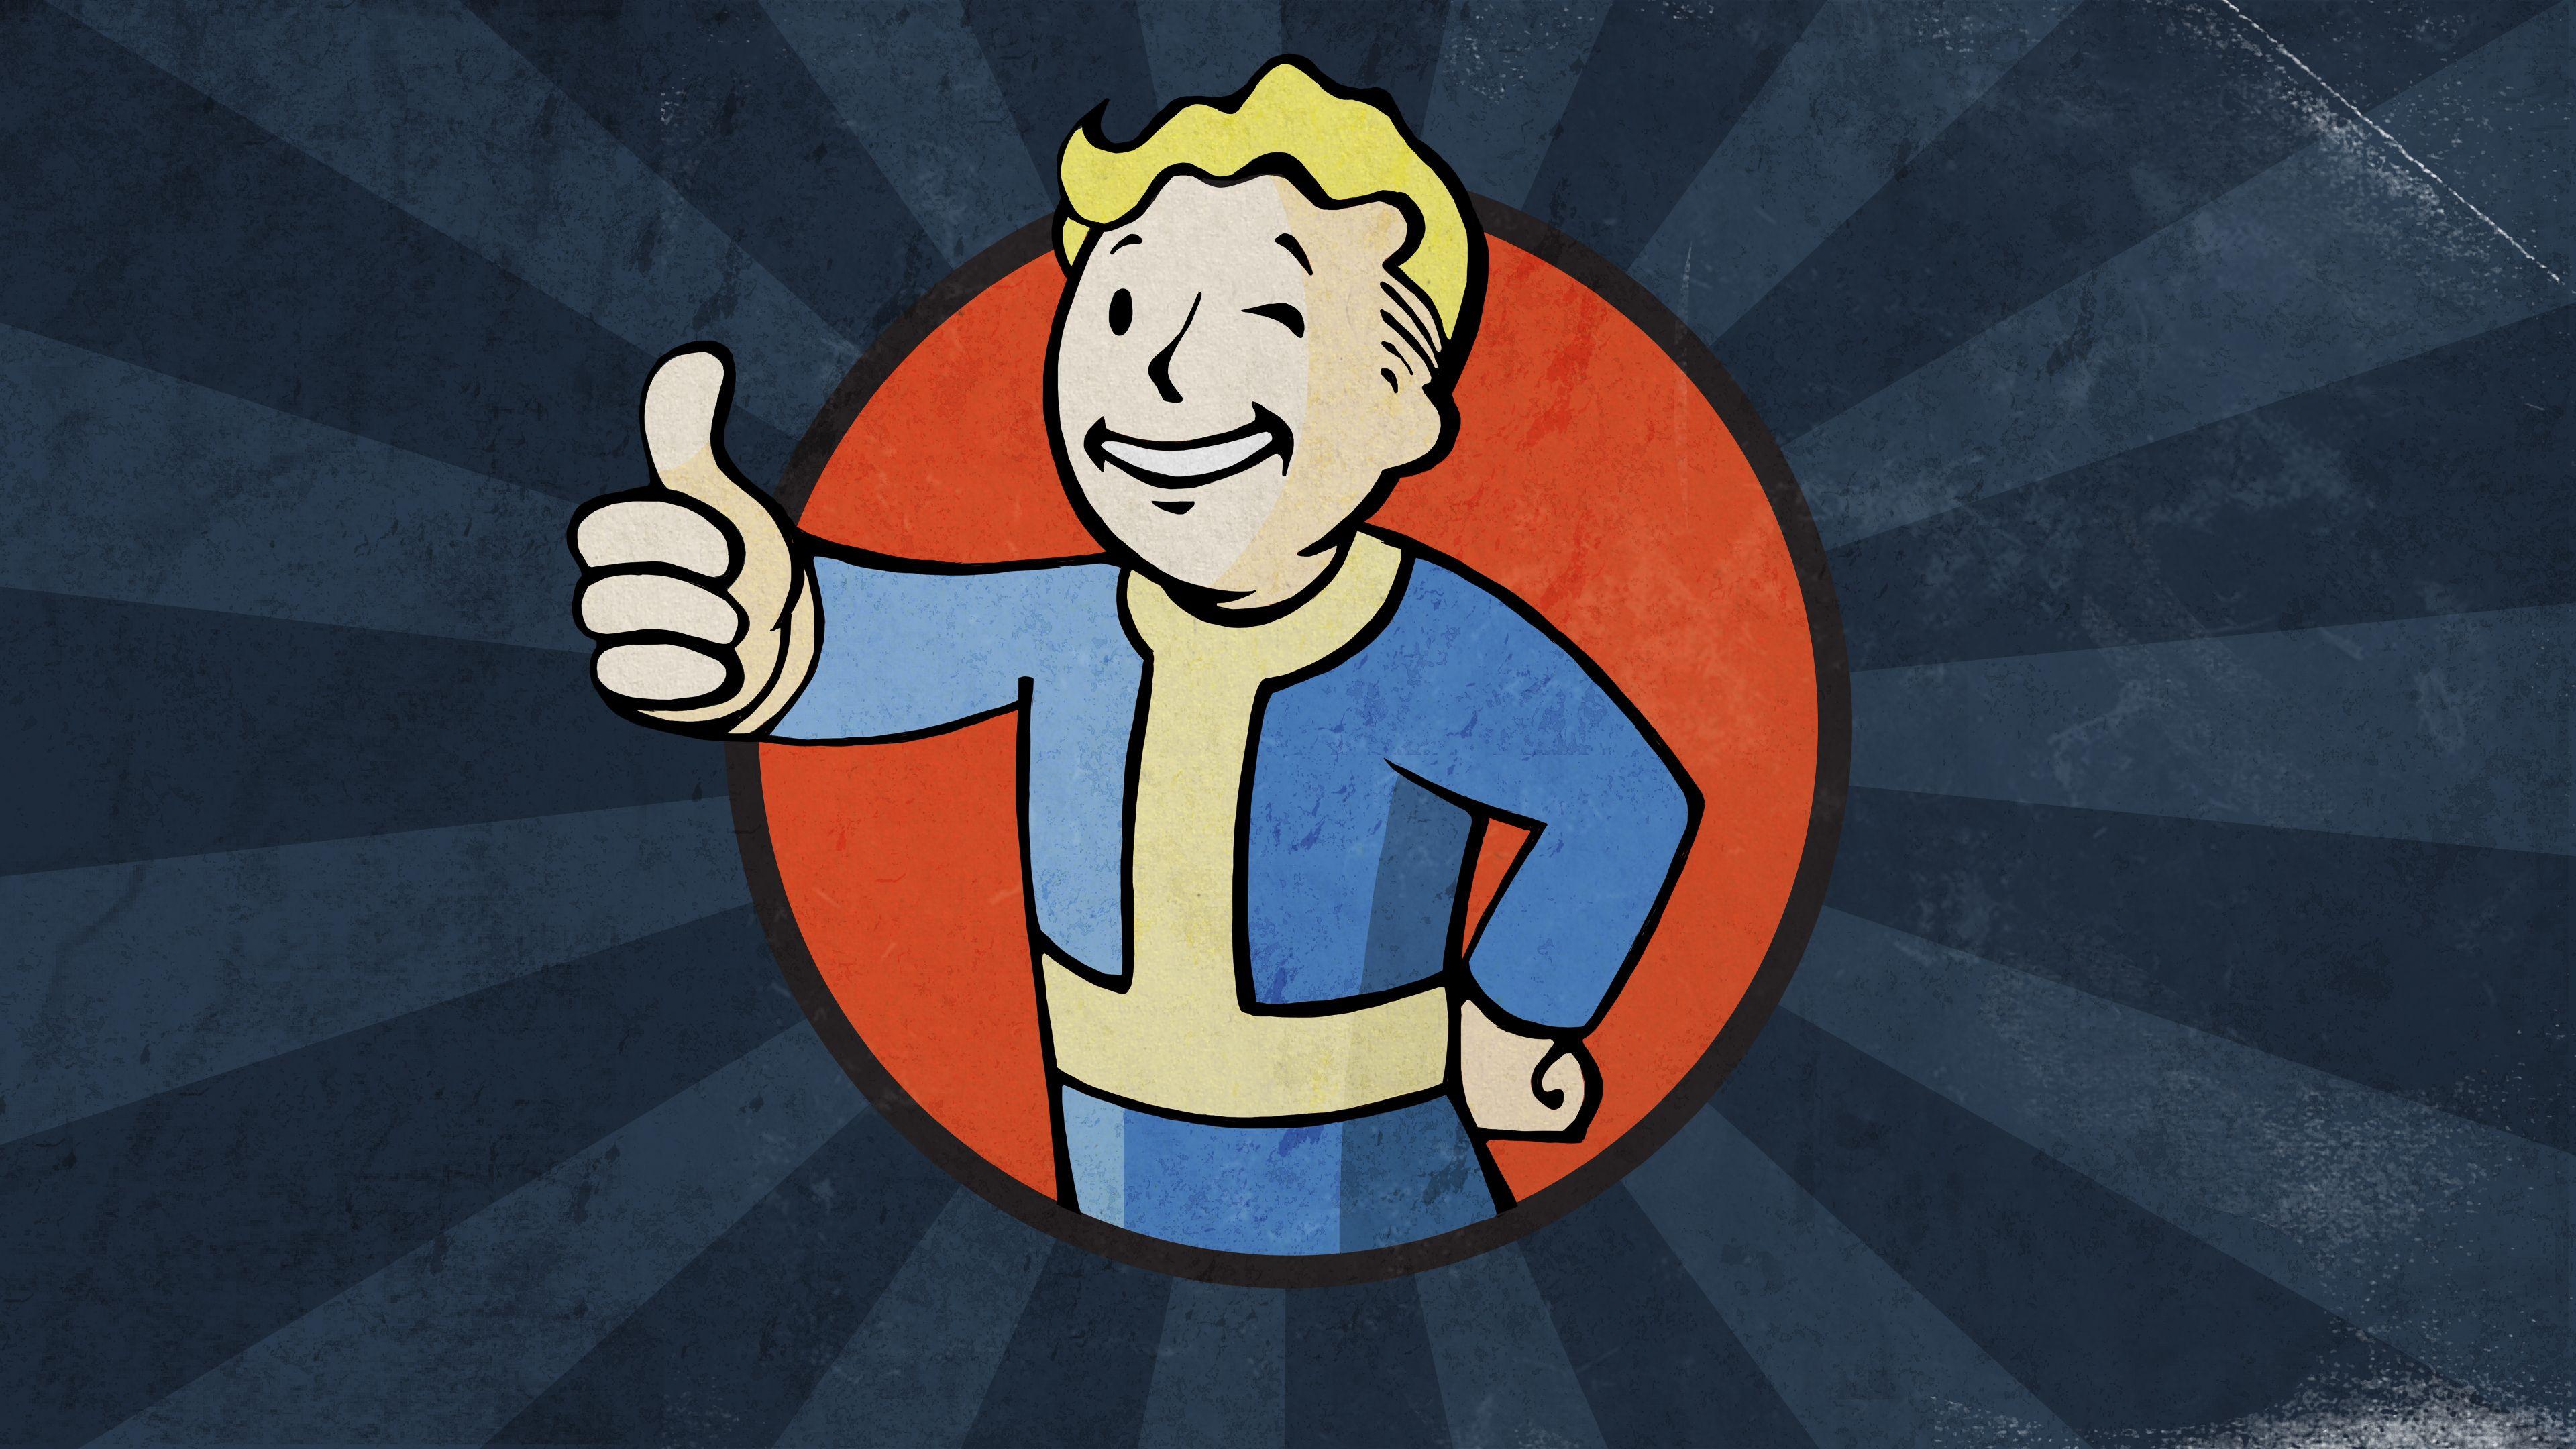 Fallout 4 4k Desktop Wallpaper Fallout Wallpaper Boys Wallpaper Hd Cool Wallpapers